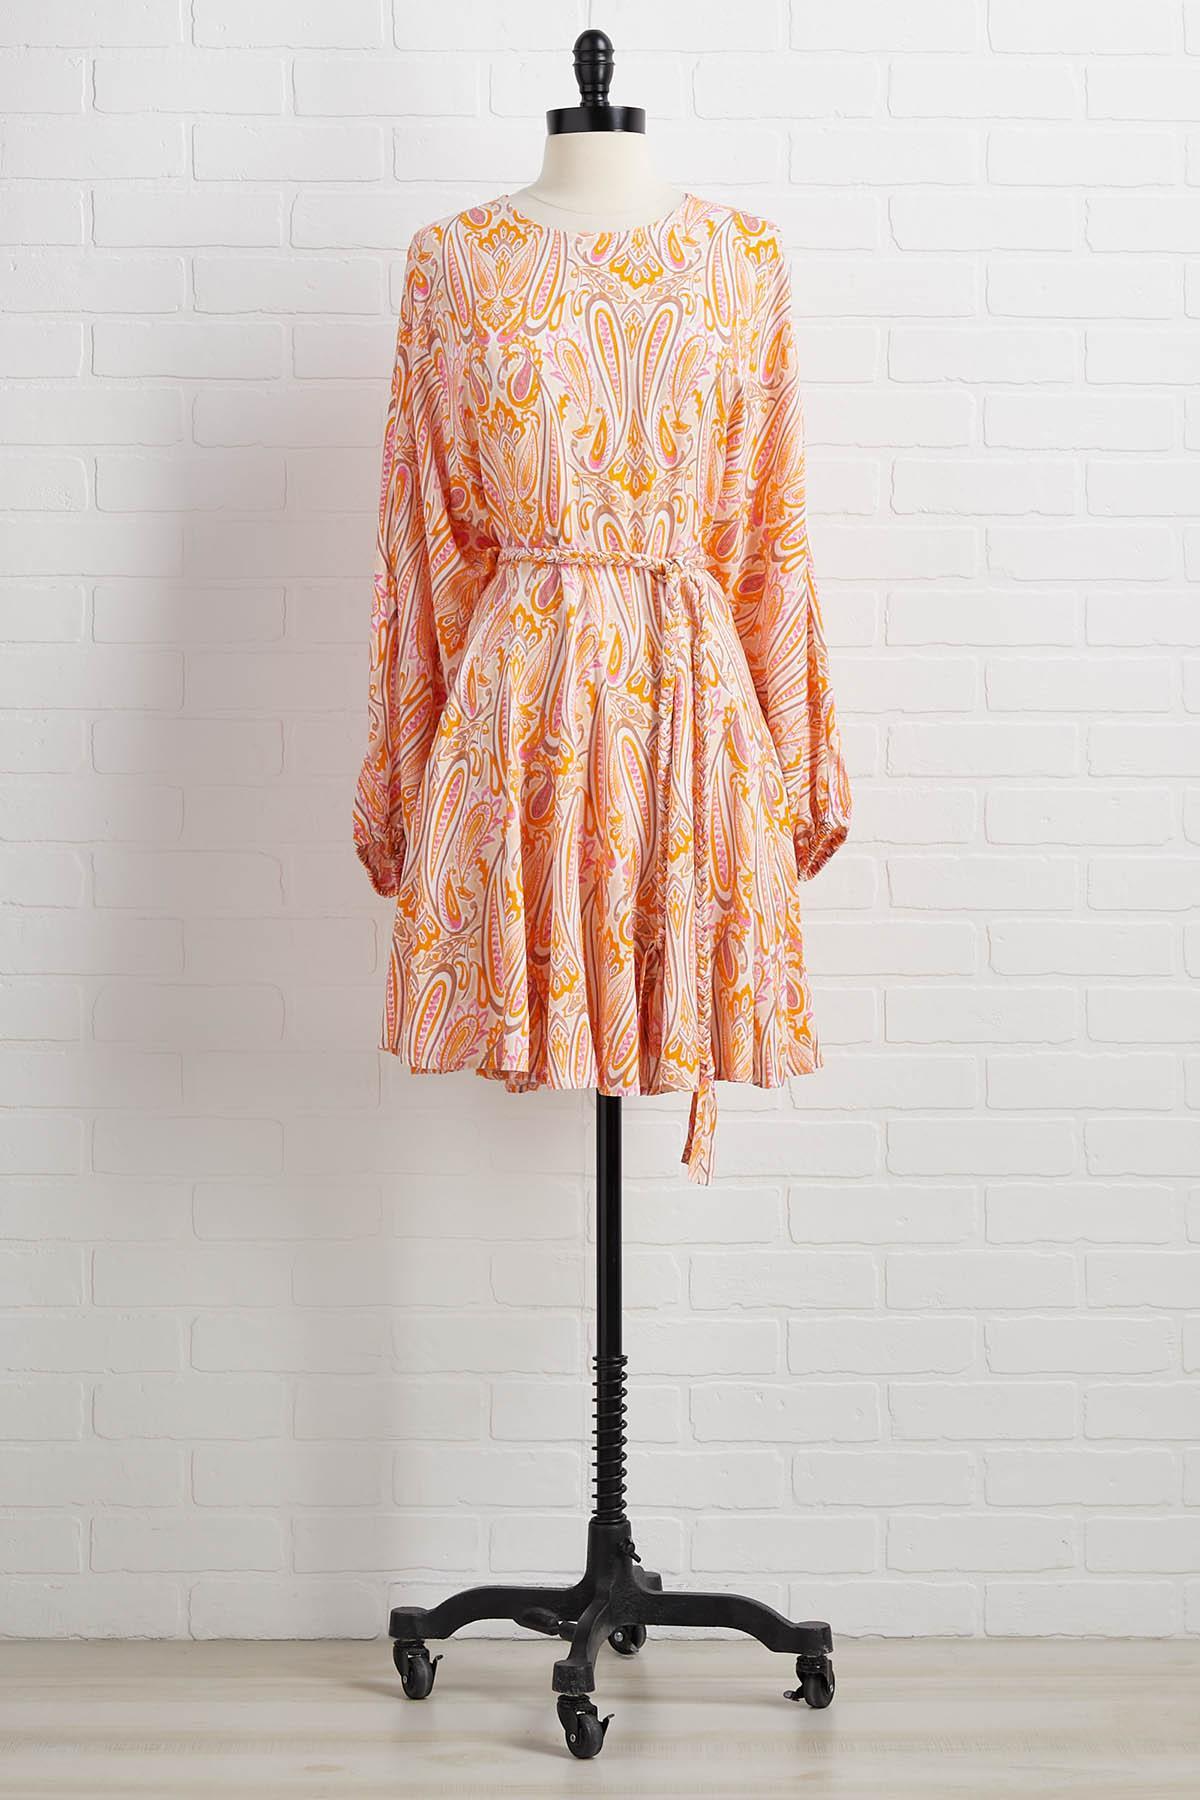 That's Groovy Dress